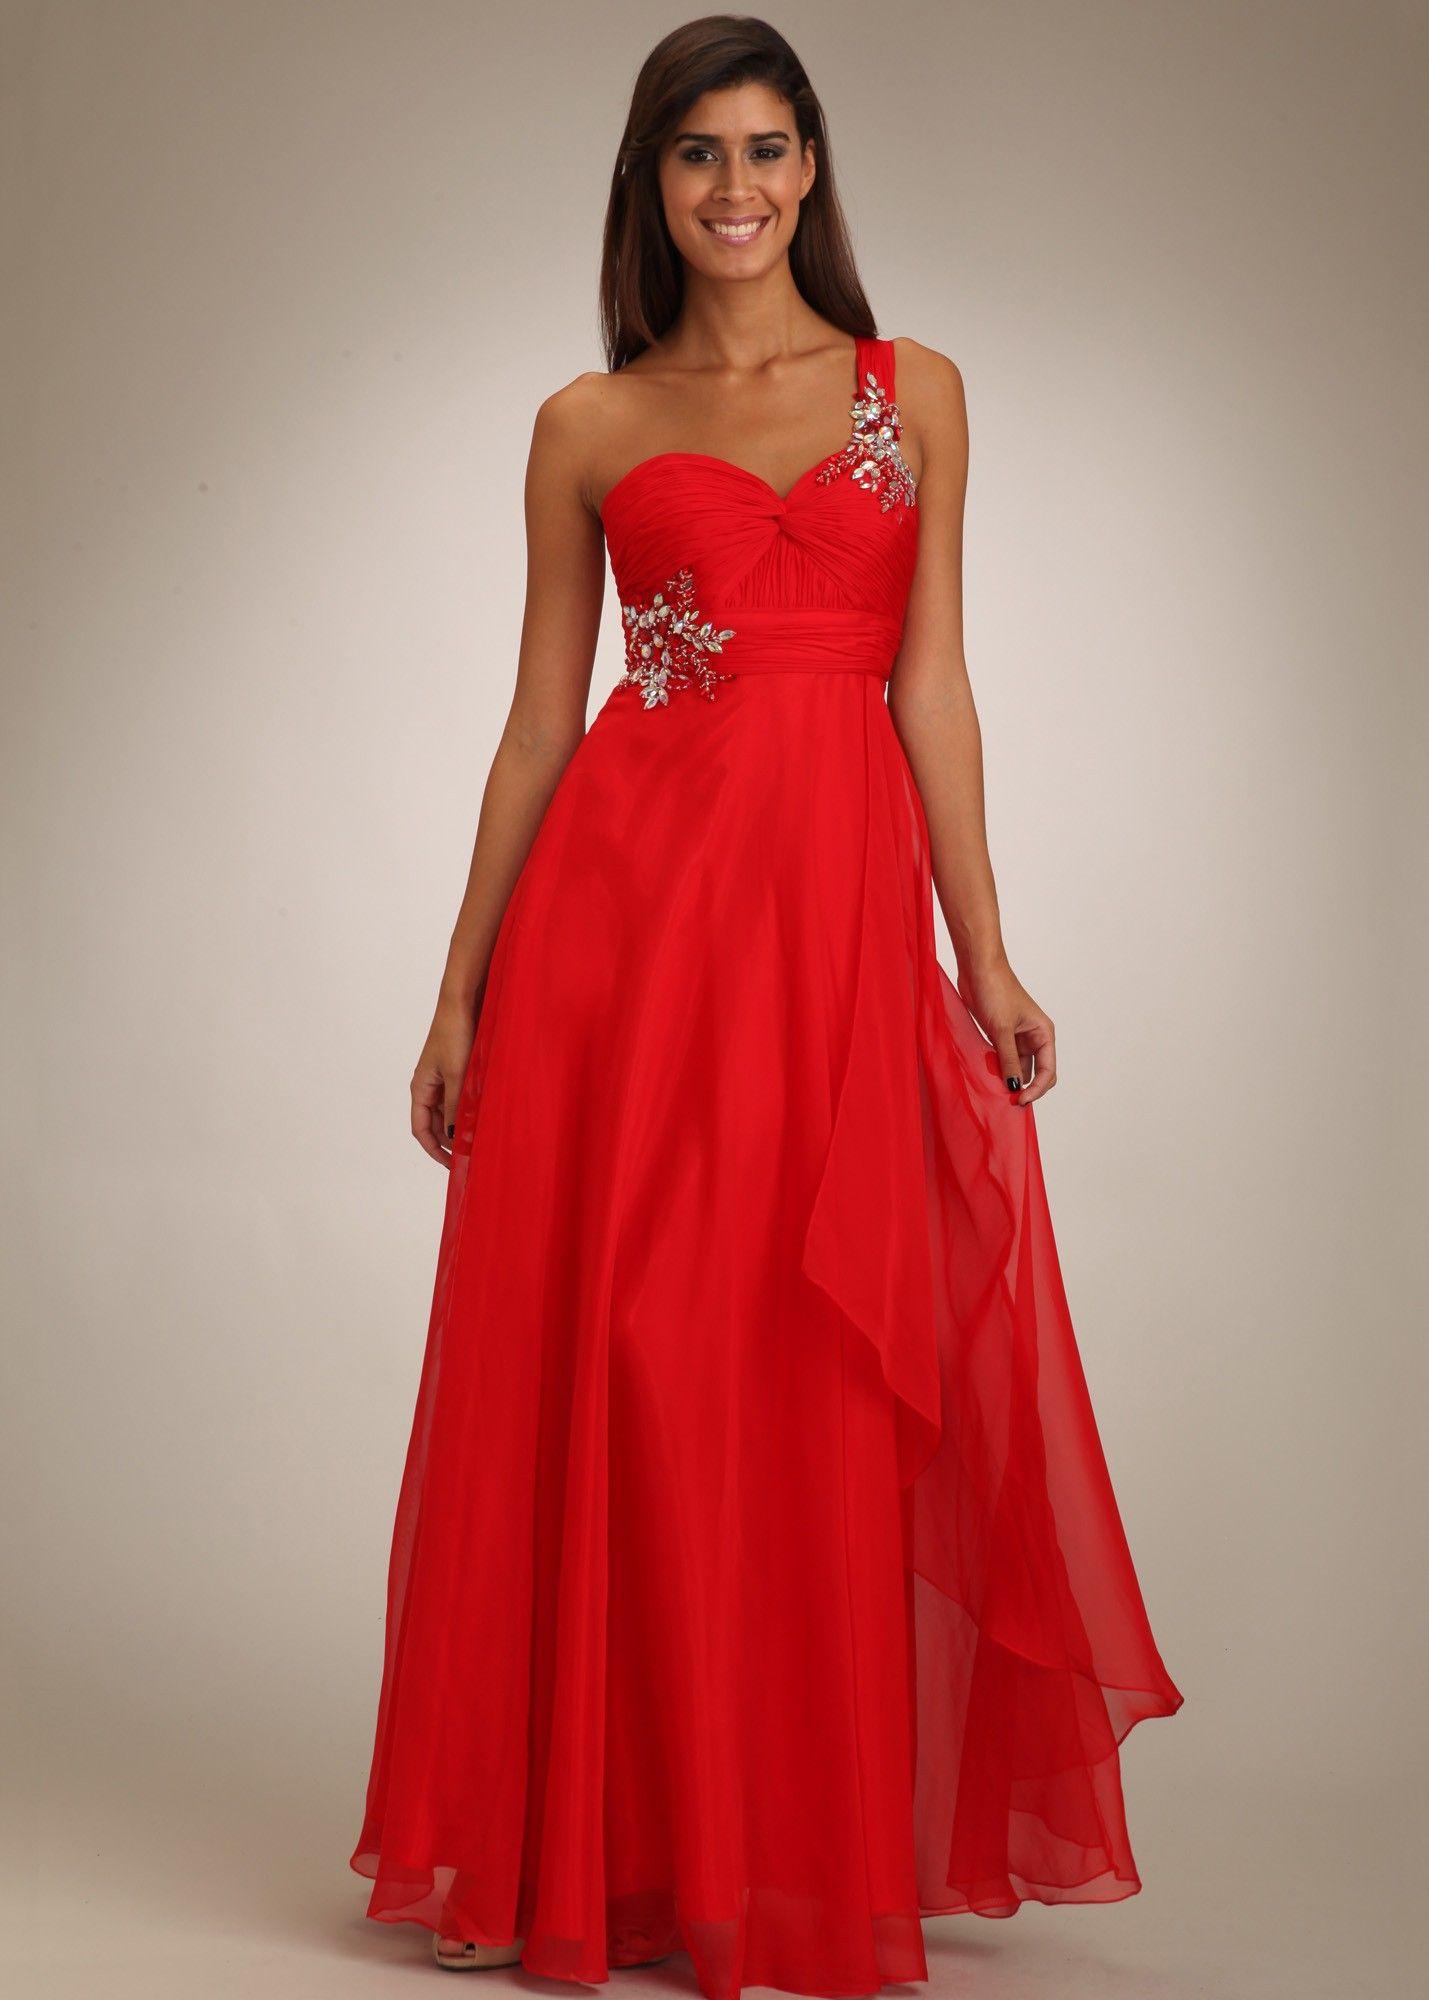 Temptation red one shoulder prom dresses rissyroos